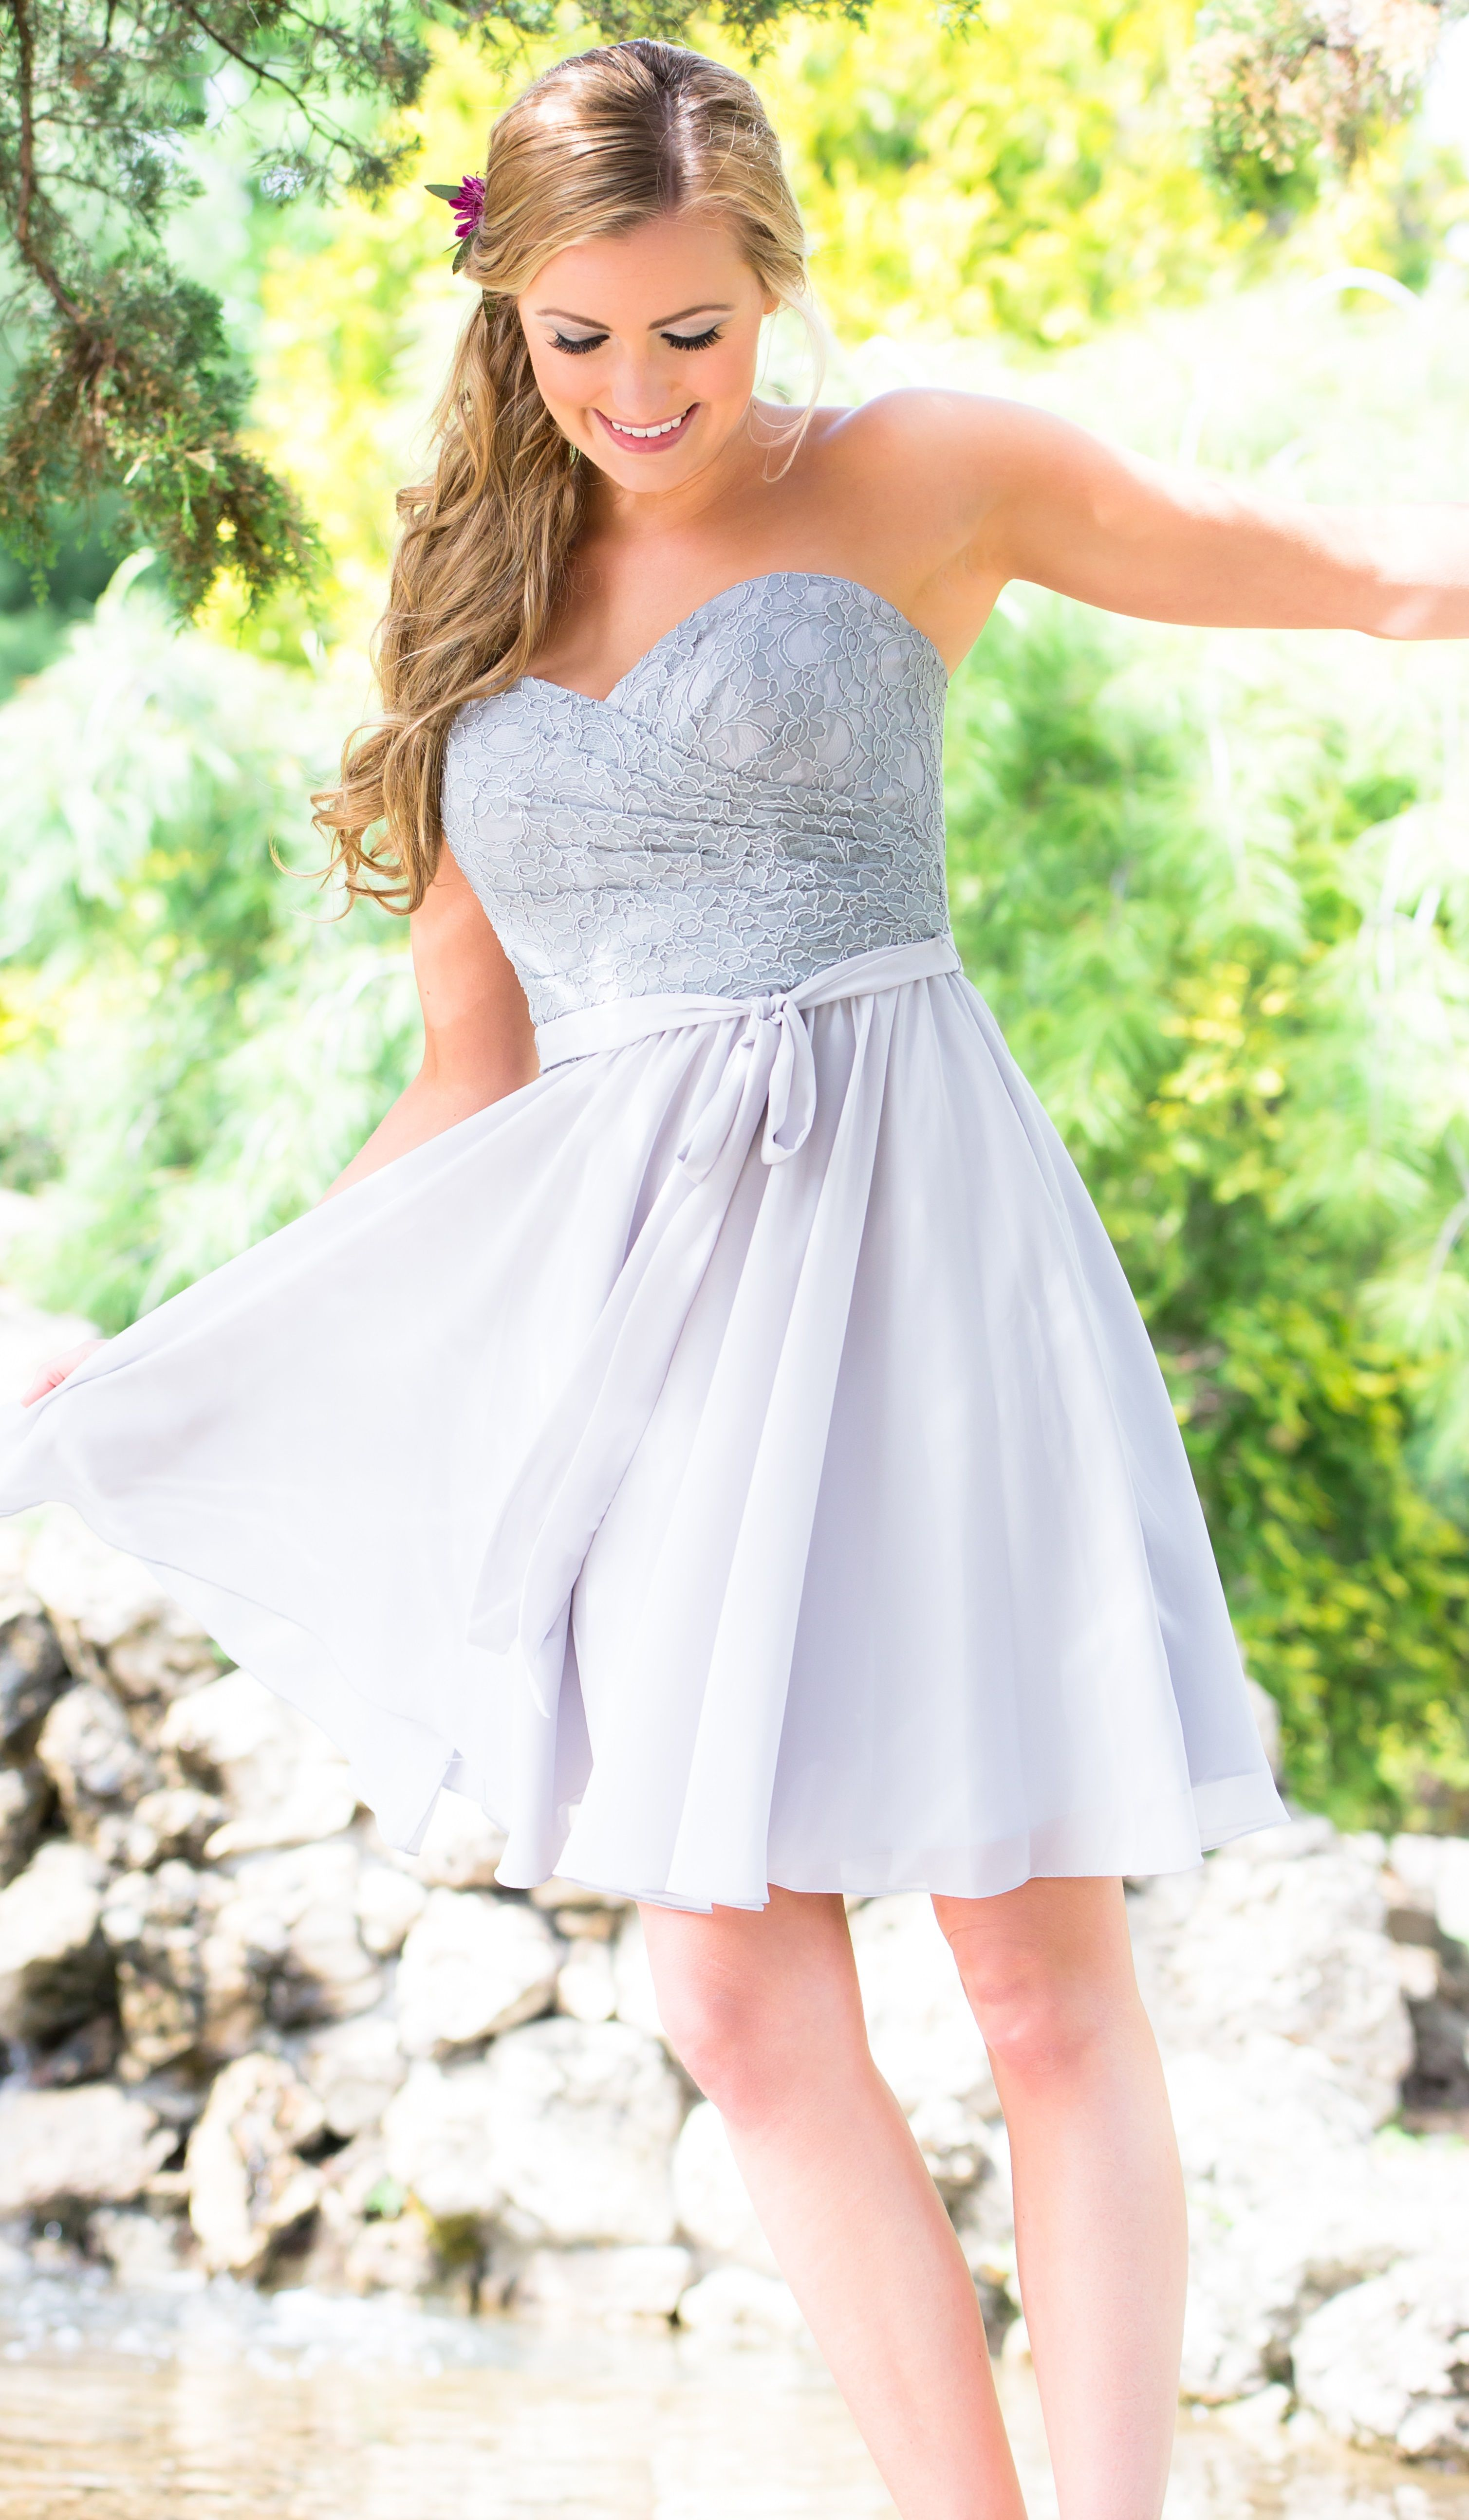 Outdoor summer wedding dresses  Laura  Kant Bruiloft en Zomer